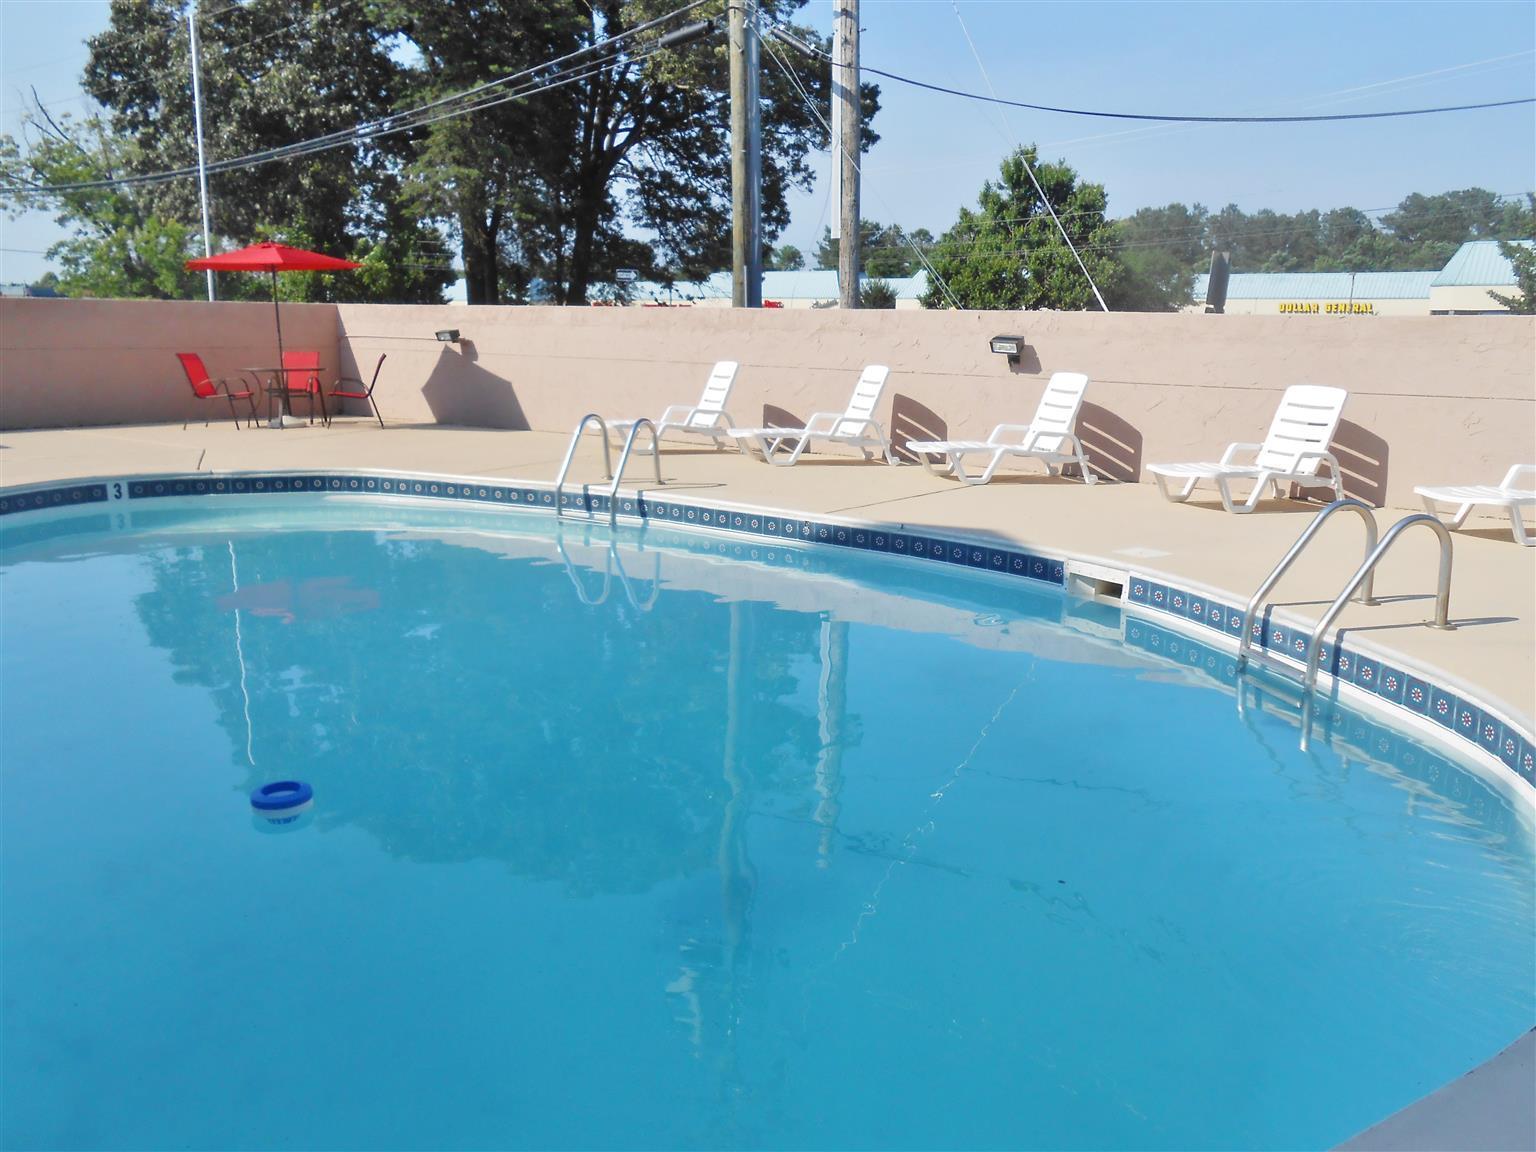 Americas Best Value Inn Williamsburg Lightfoot Area Williamsburg (VA)